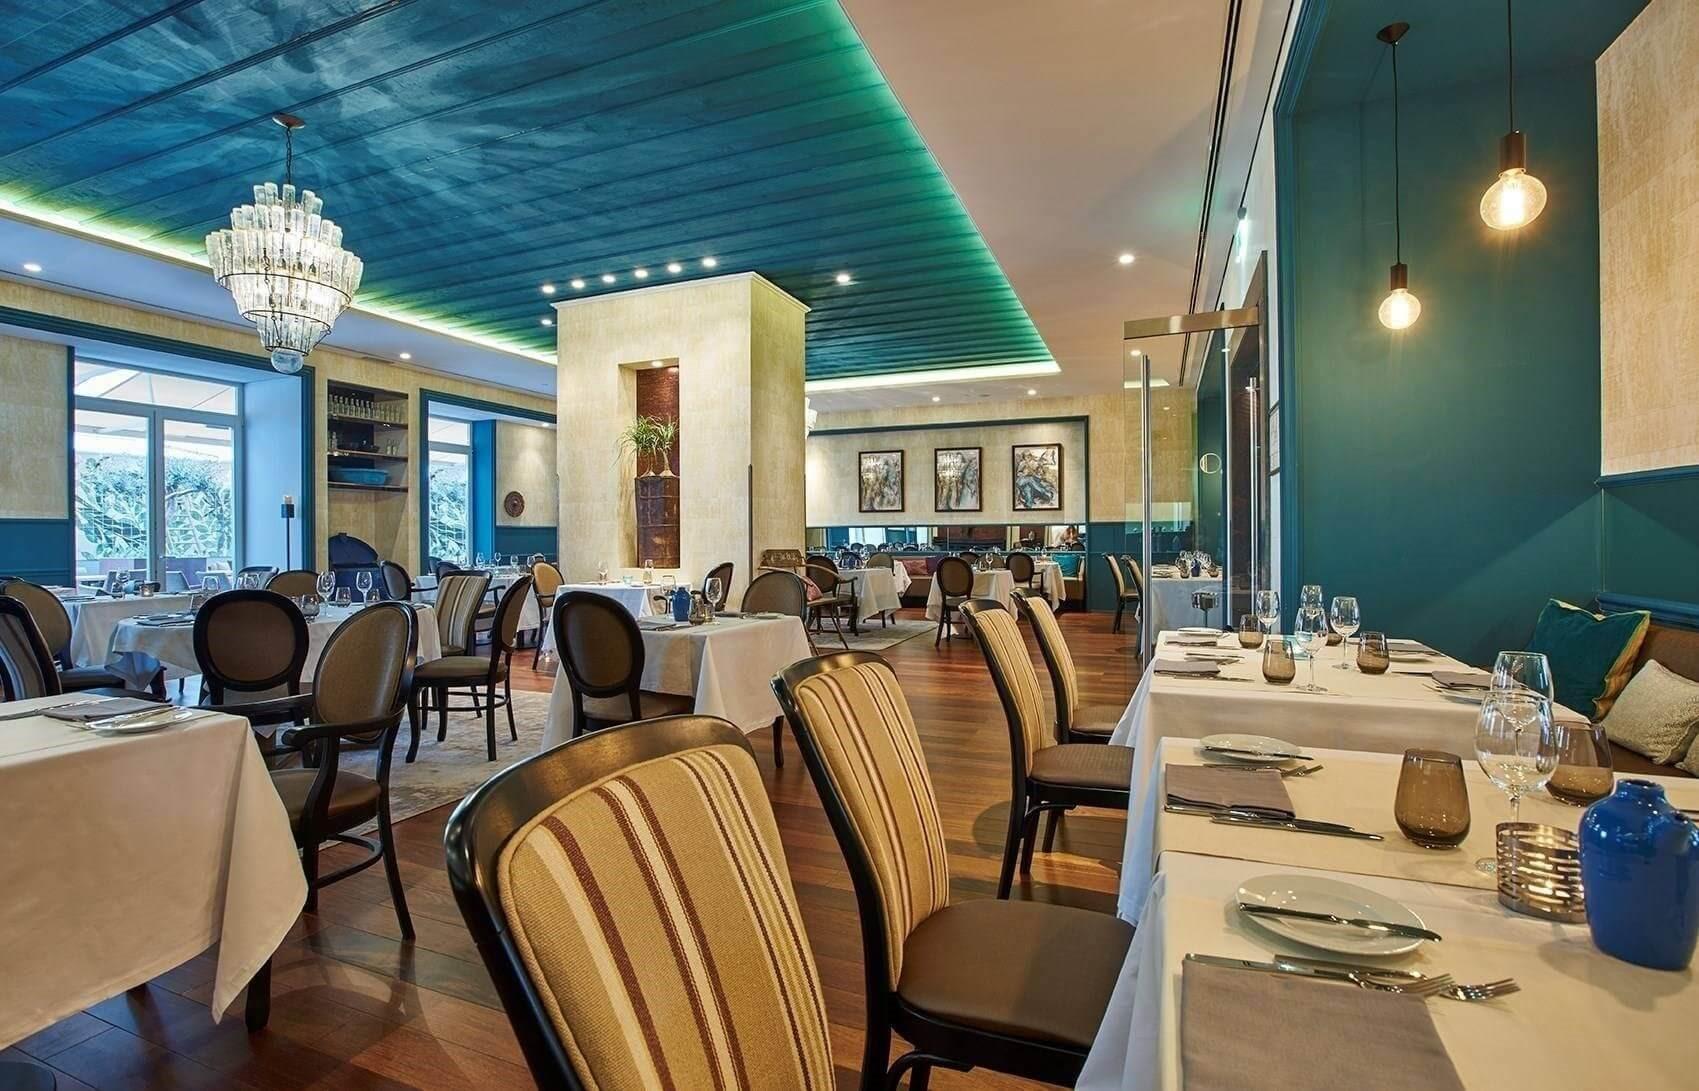 Hotel PortoBay Liberdade - Lisbon - Bistro 4 Restaurant